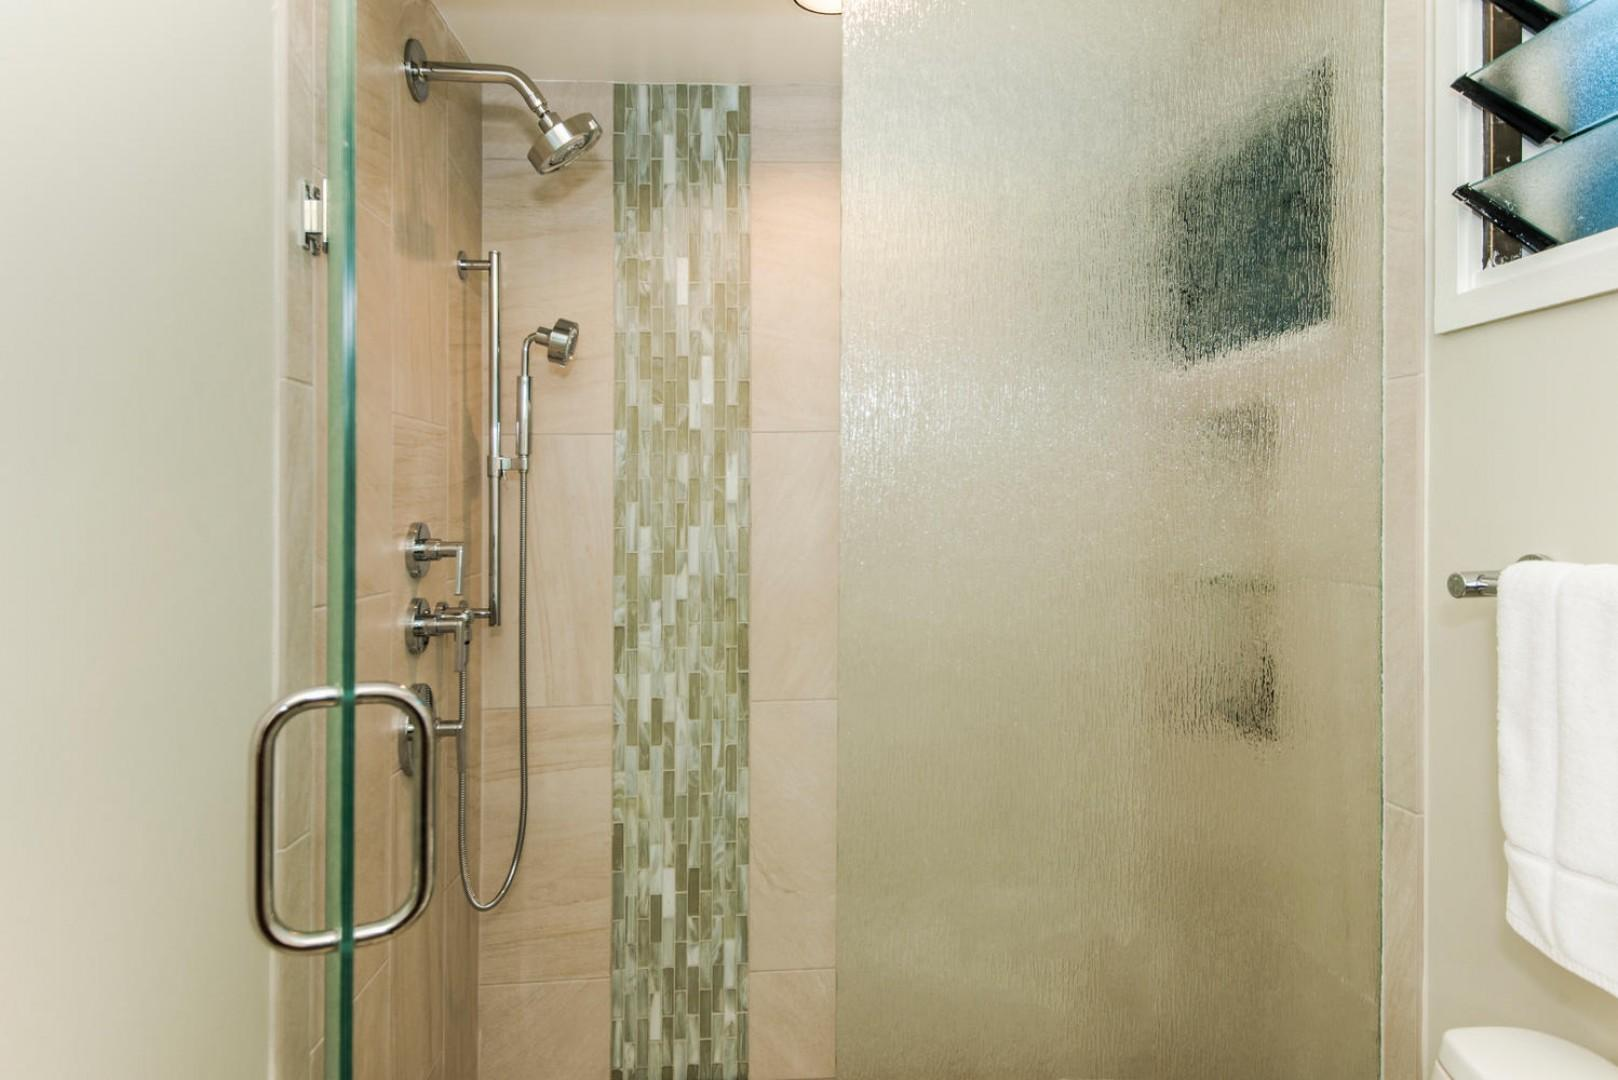 Pool House - Newly Remodeled Bathroom